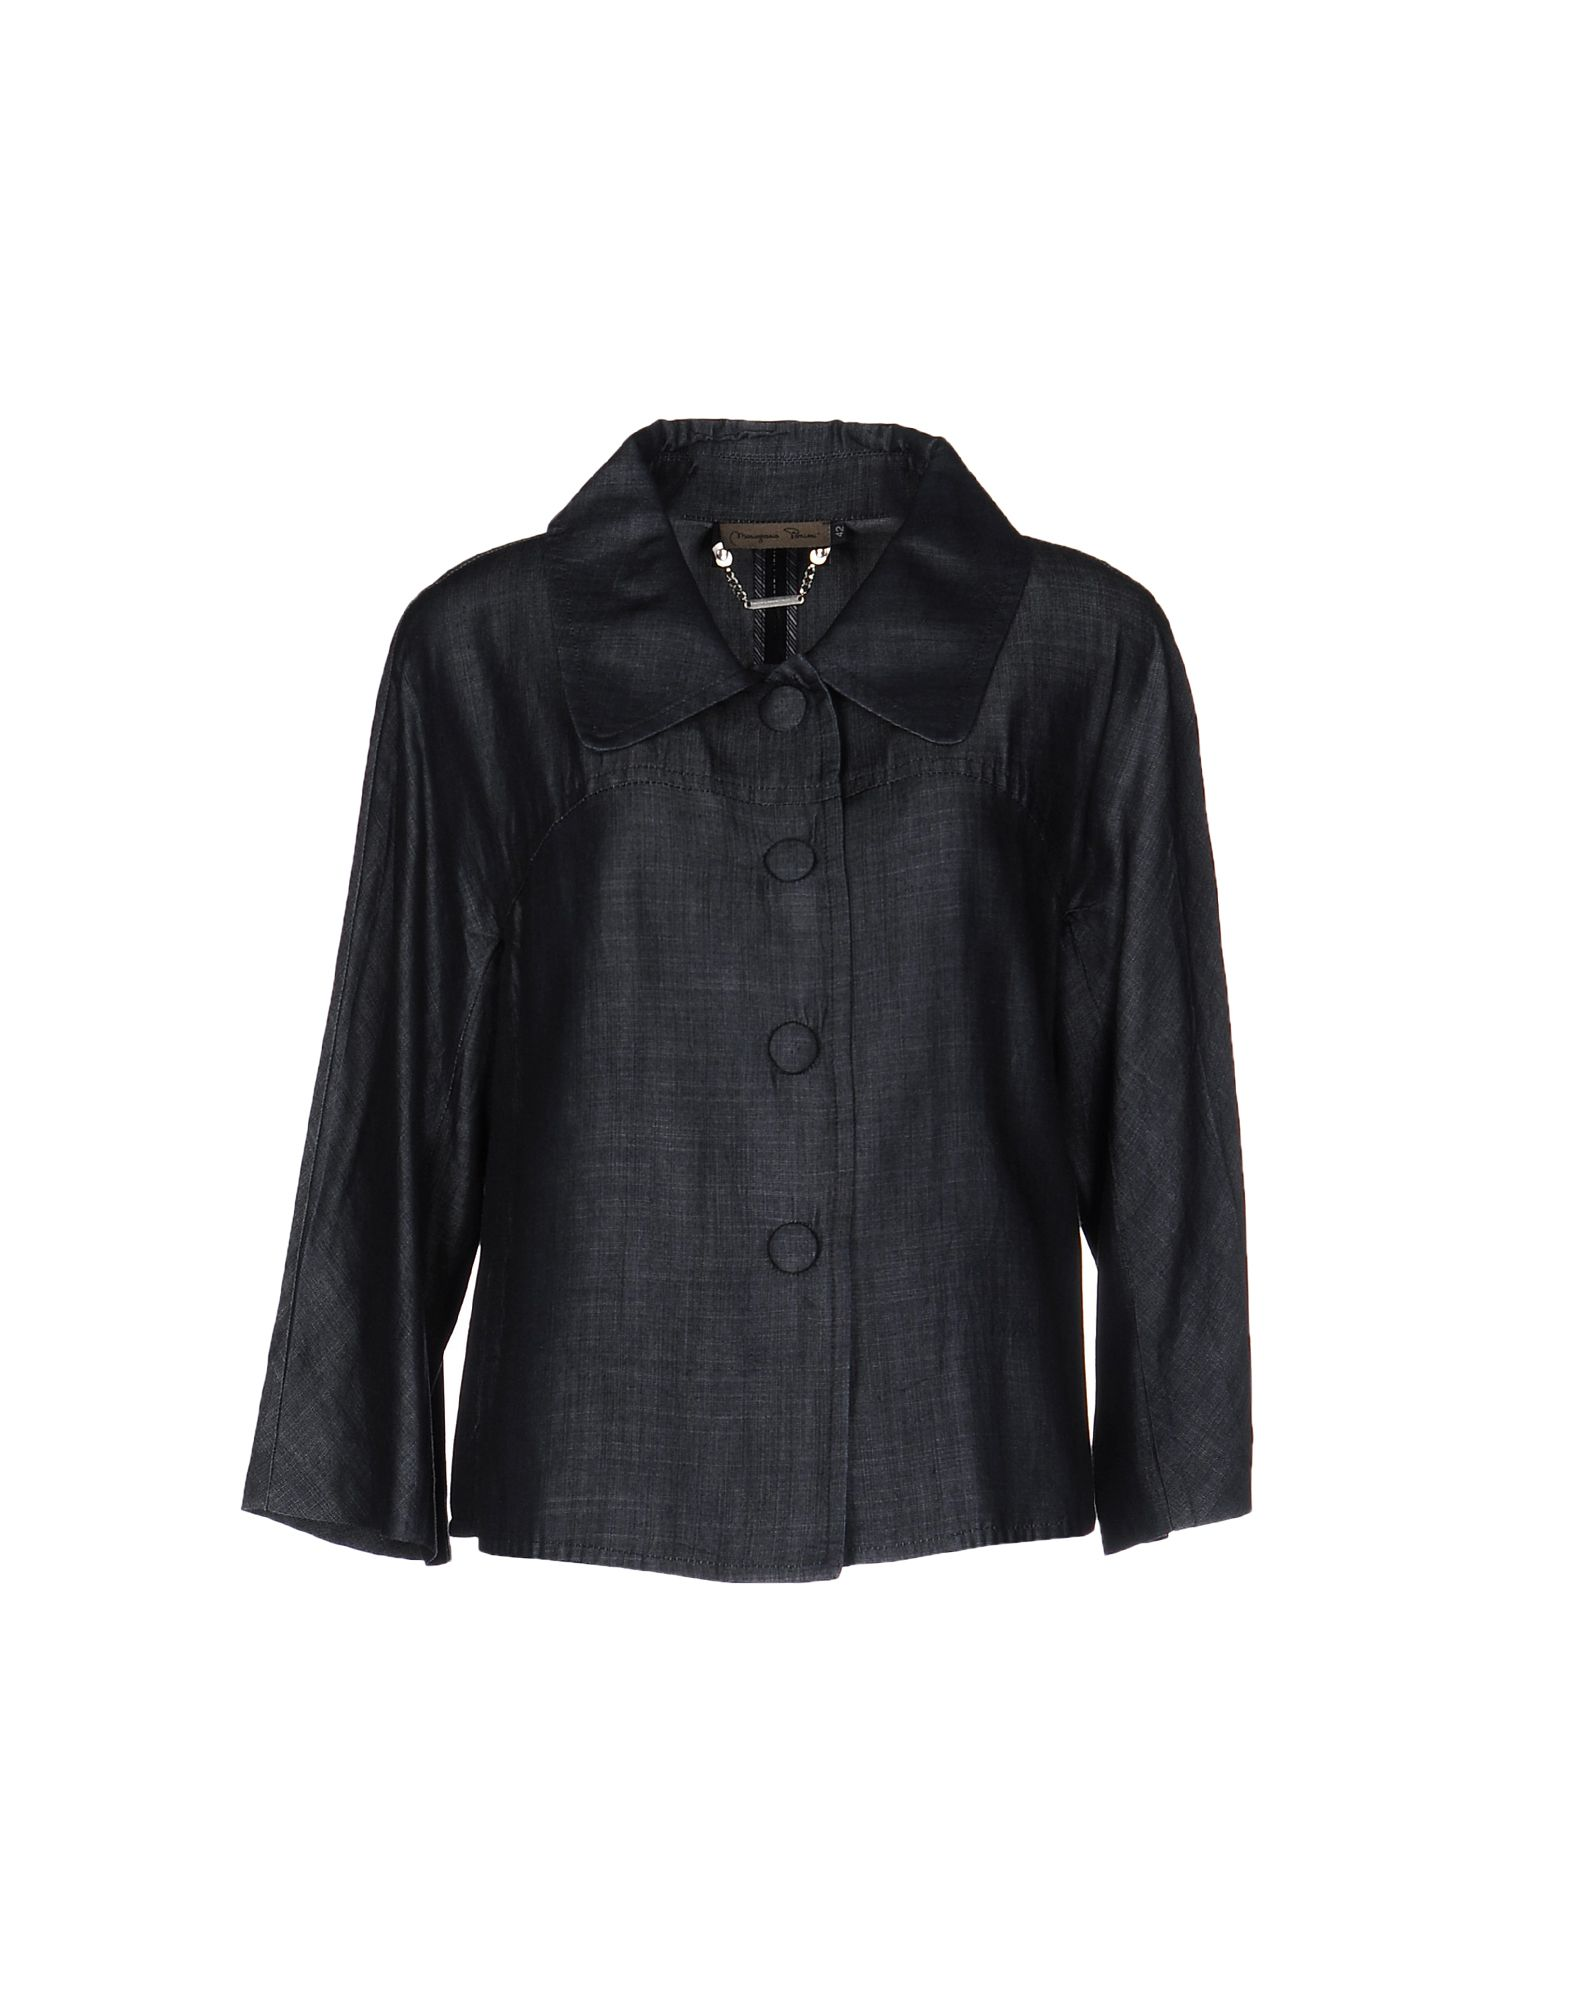 MARIAGRAZIA PANIZZI Джинсовая верхняя одежда kengstar джинсовая верхняя одежда